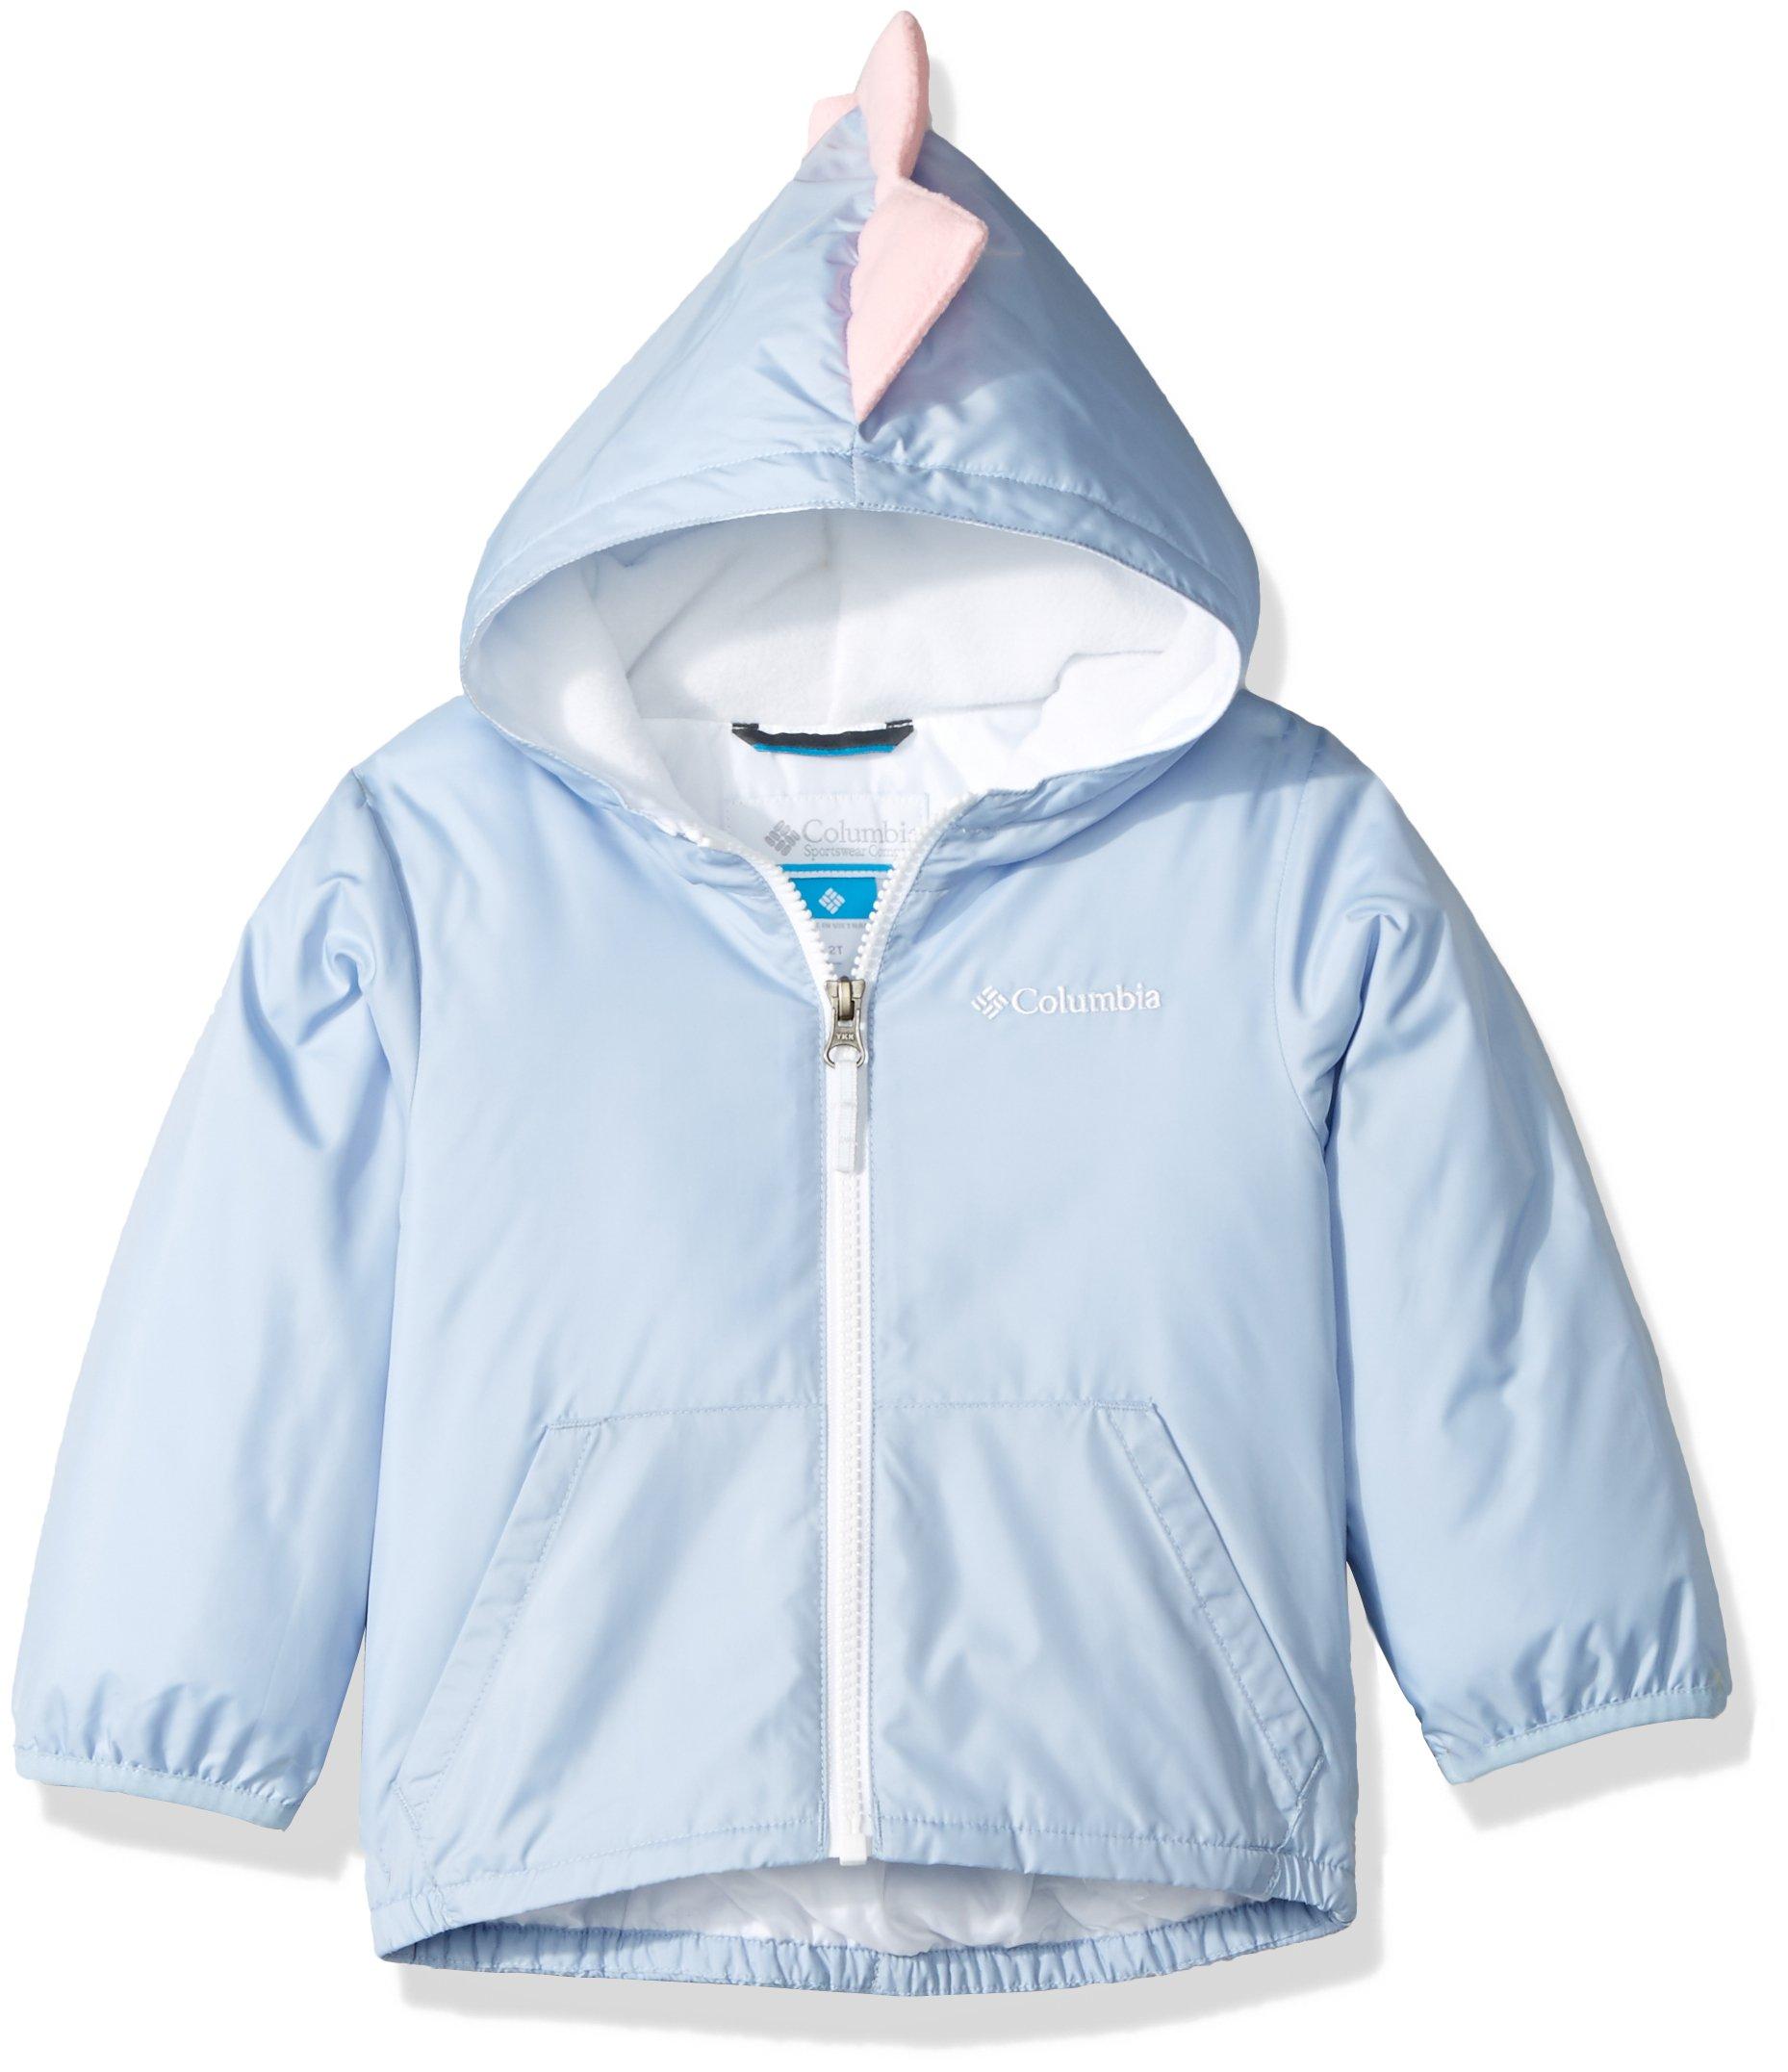 Columbia Boys' Toddler Kitterwibbit Jacket, Faded Sky, 2T